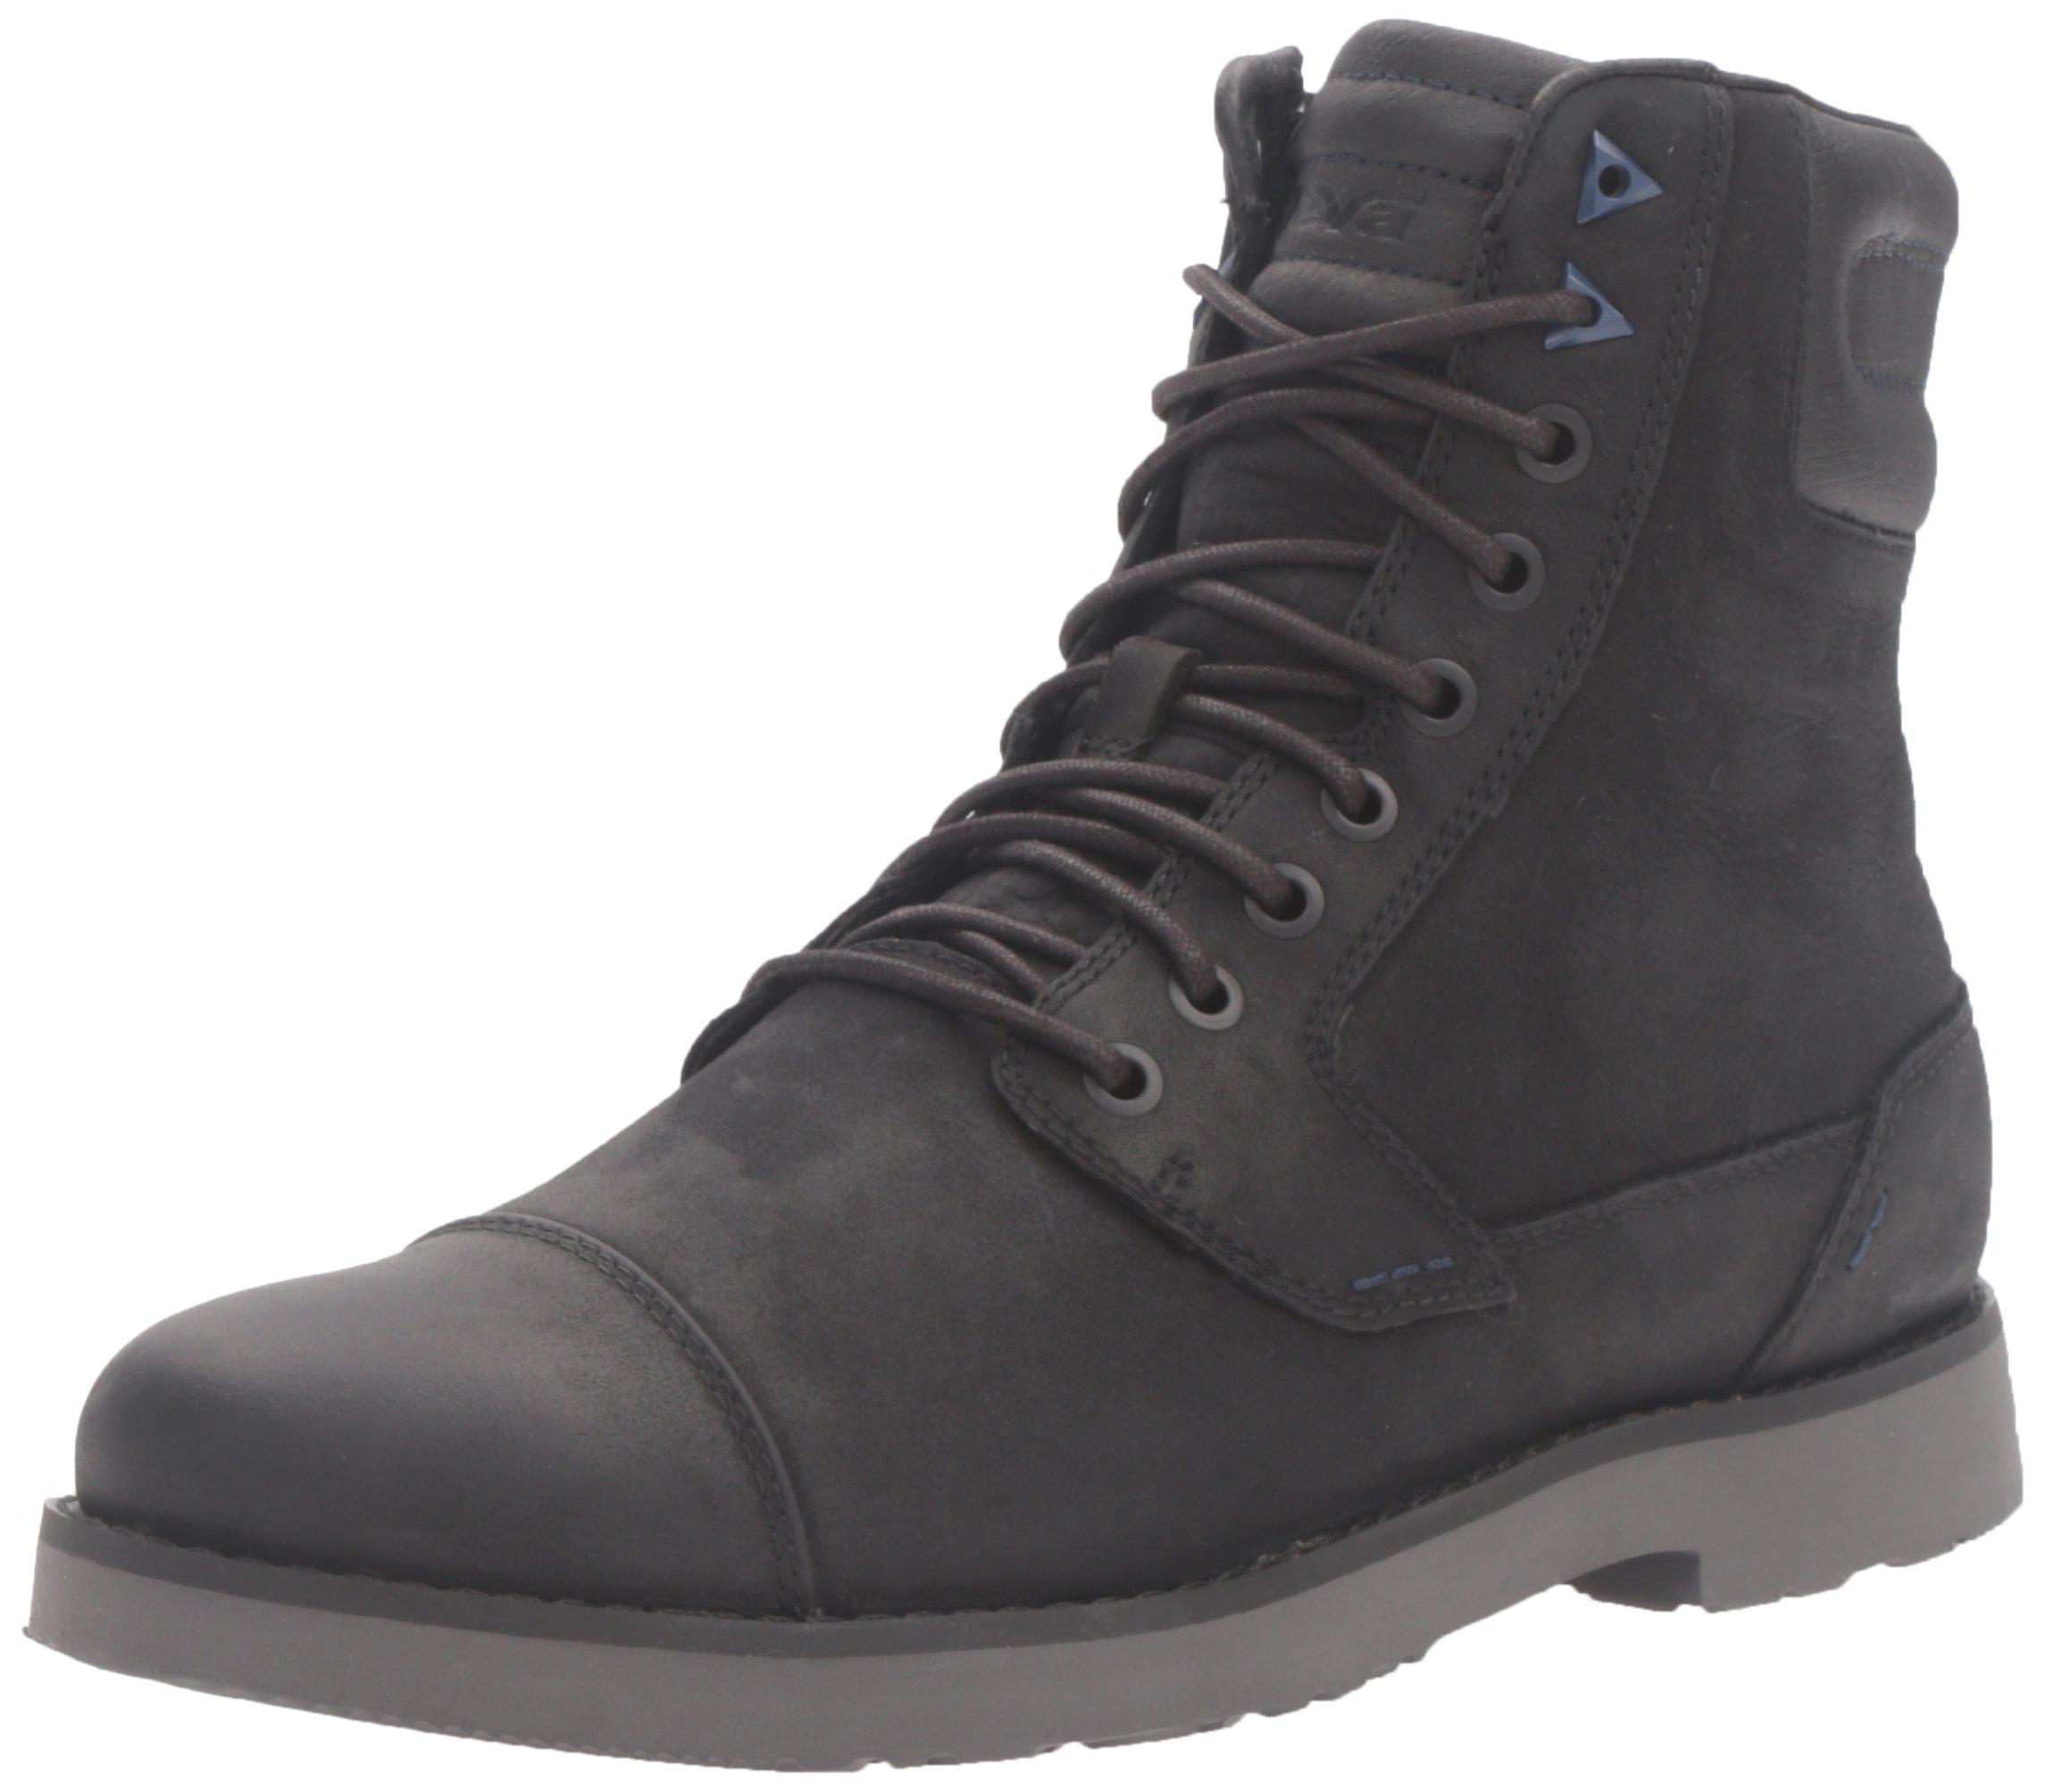 Teva Men's M Durban Tall-Leather Boot, Black/Dark Shadow, 14 M US